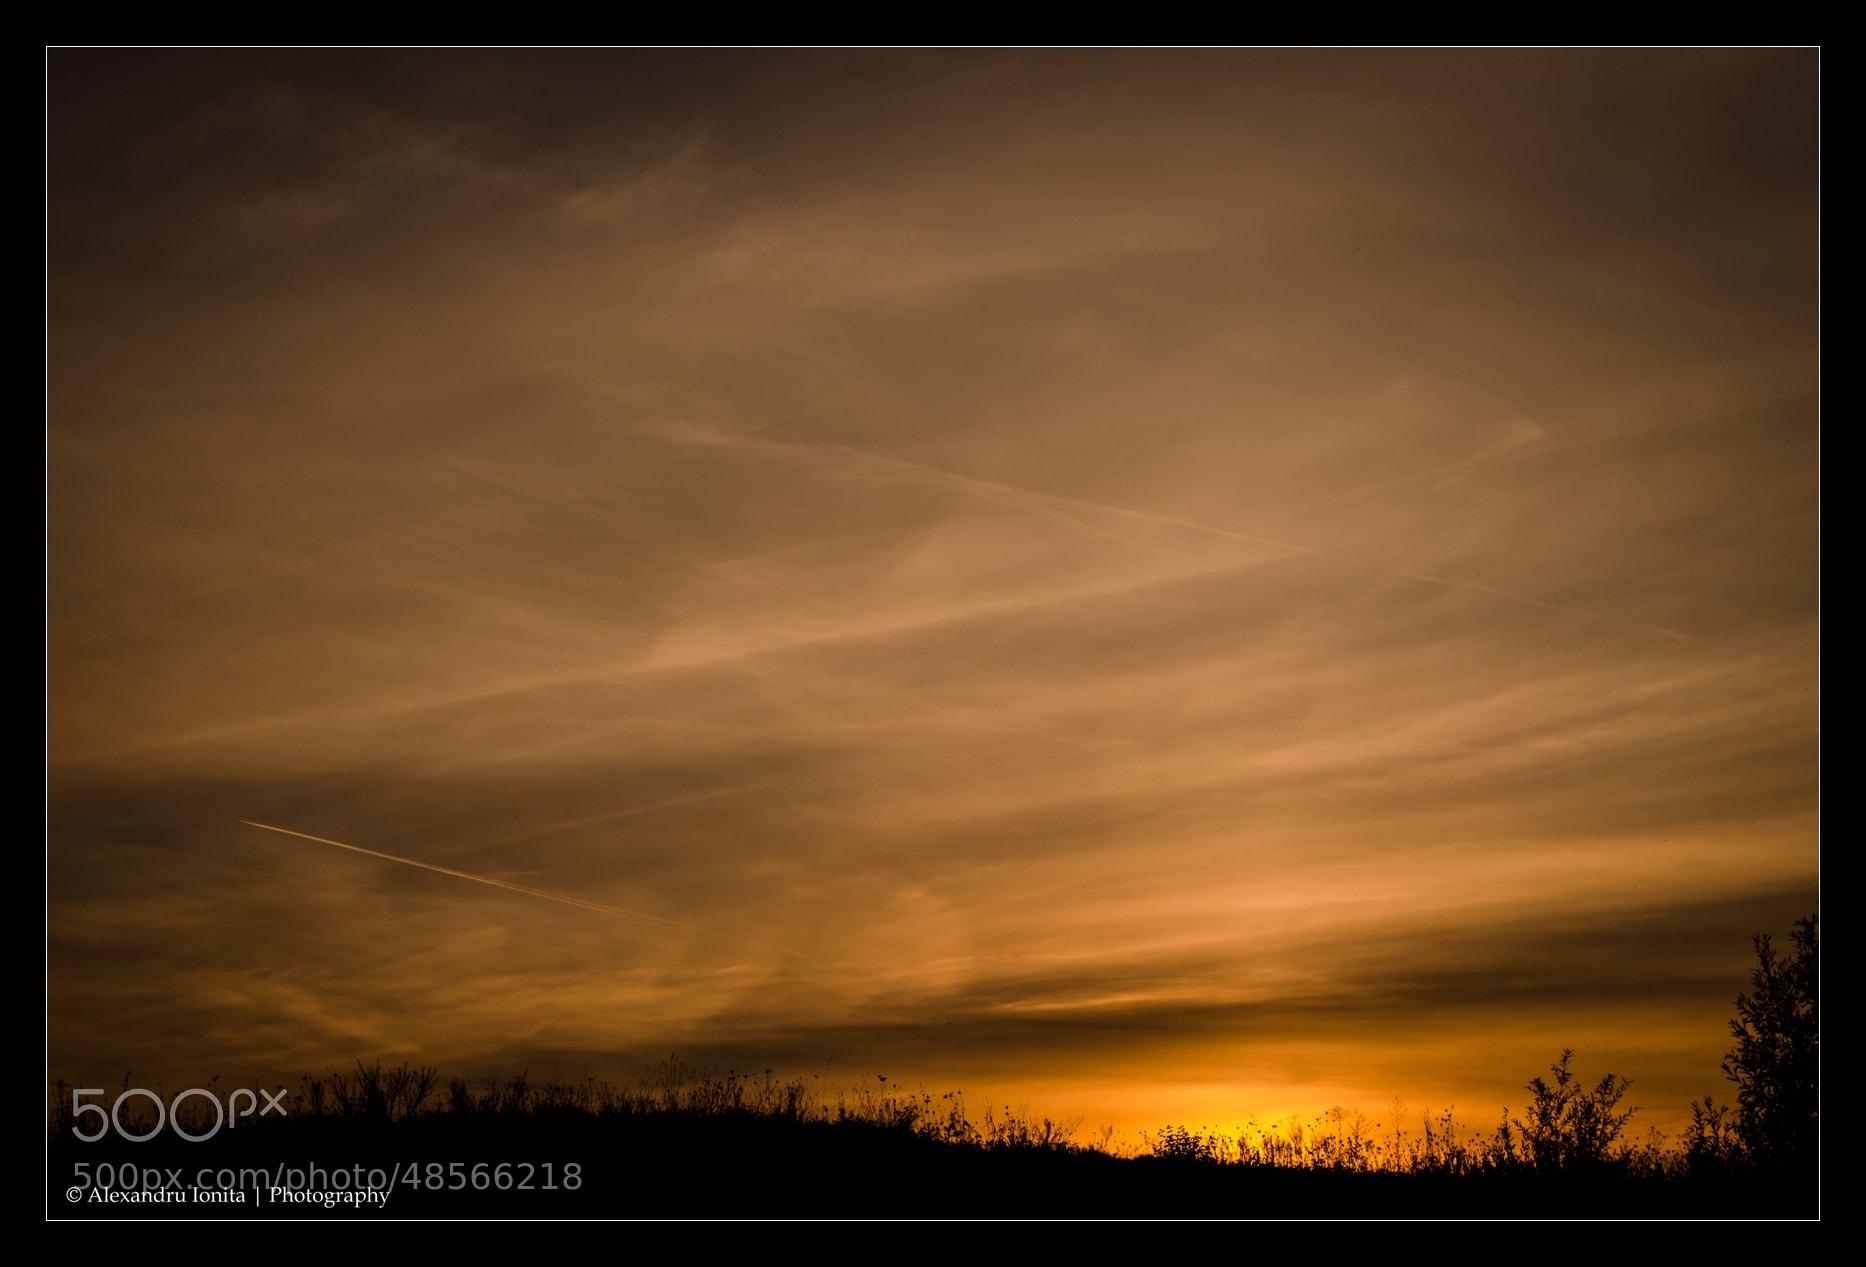 Photograph Sunset 21.09.13 by Alexandru Ionita on 500px